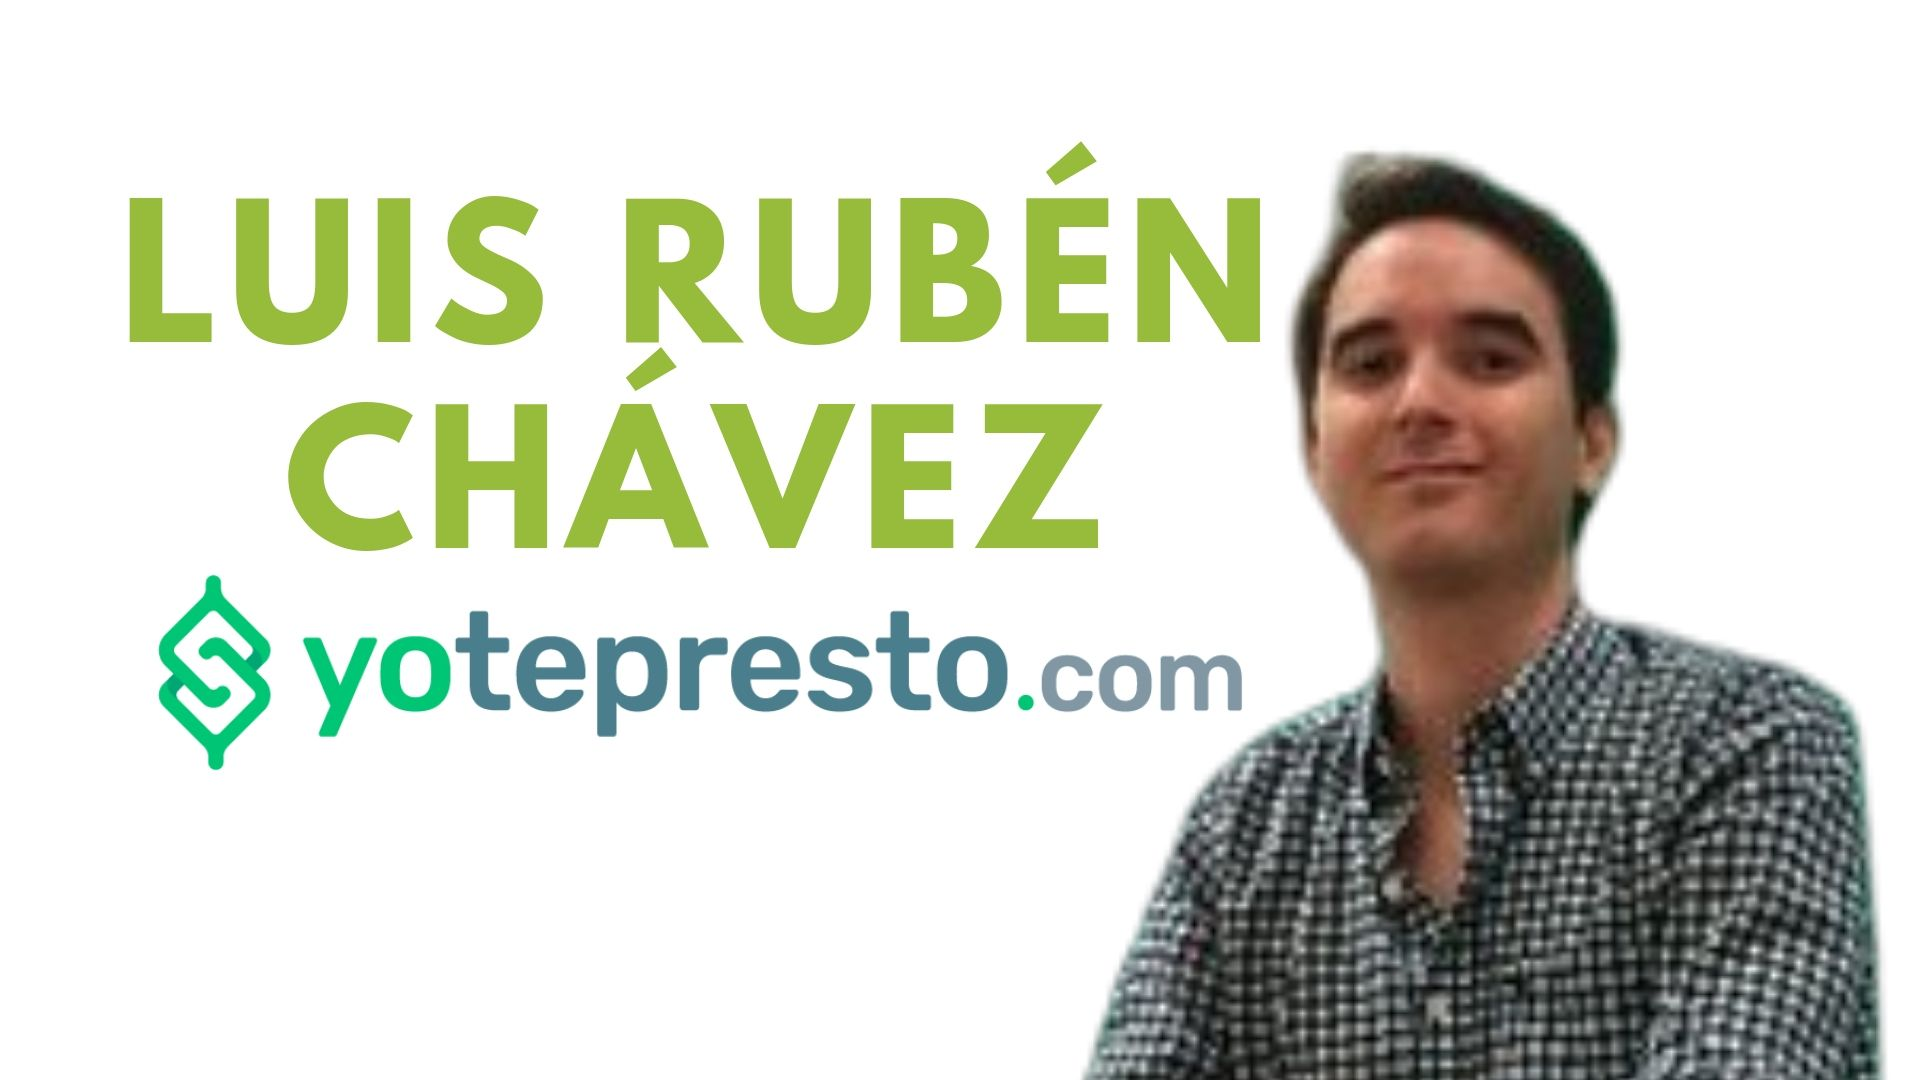 Luis Rubén Chávez Yotepresto